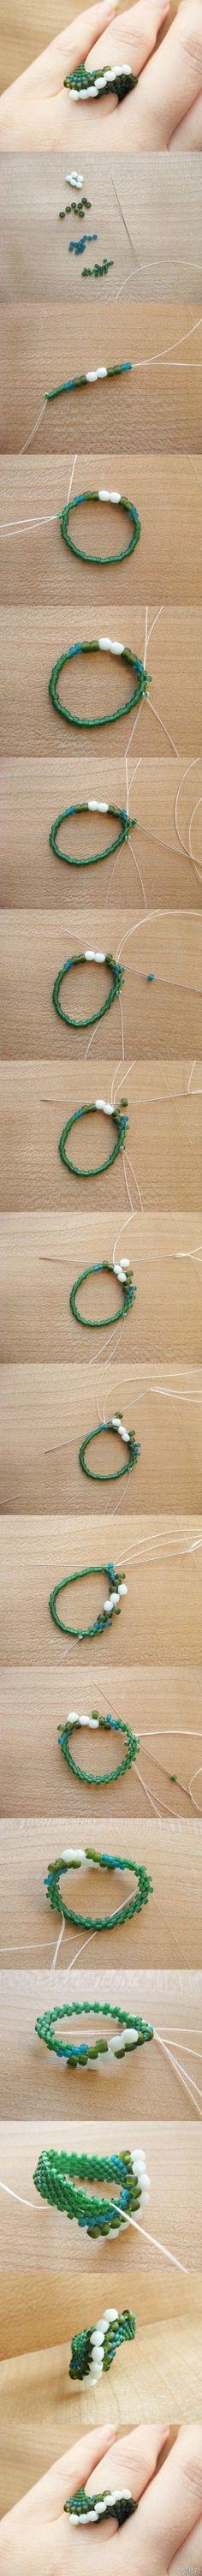 Ring of Beads Beaded Crafts, Jewelry Crafts, Handmade Jewelry, Diy Beaded Rings, Beaded Bracelets, Diy Rings, Seed Bead Jewelry, Bead Jewellery, Armband Diy